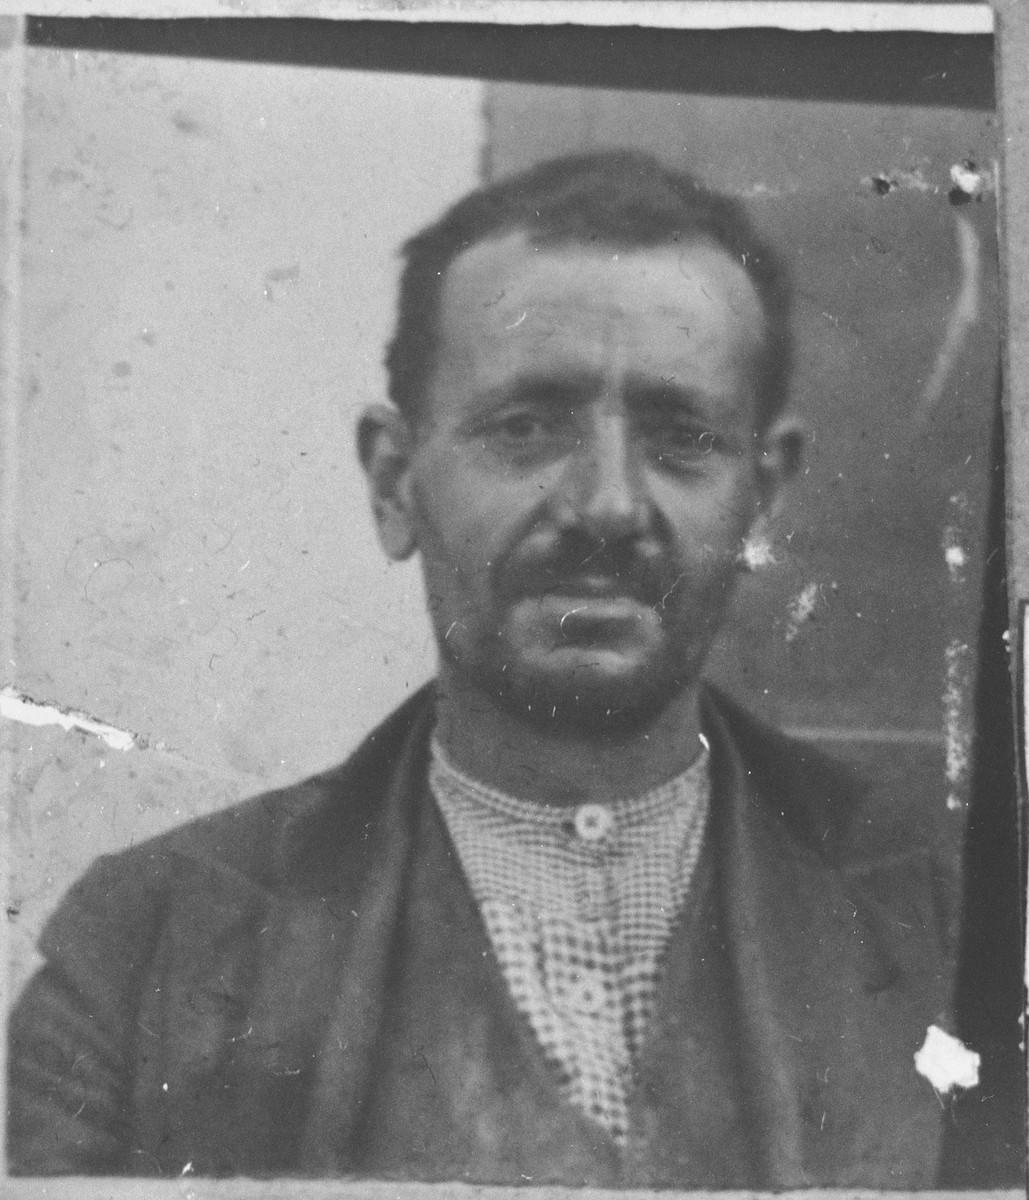 Portrait of Yuda Kalderon, son of Sava Kalderon.  He lived at Novatska 7 in Bitola.